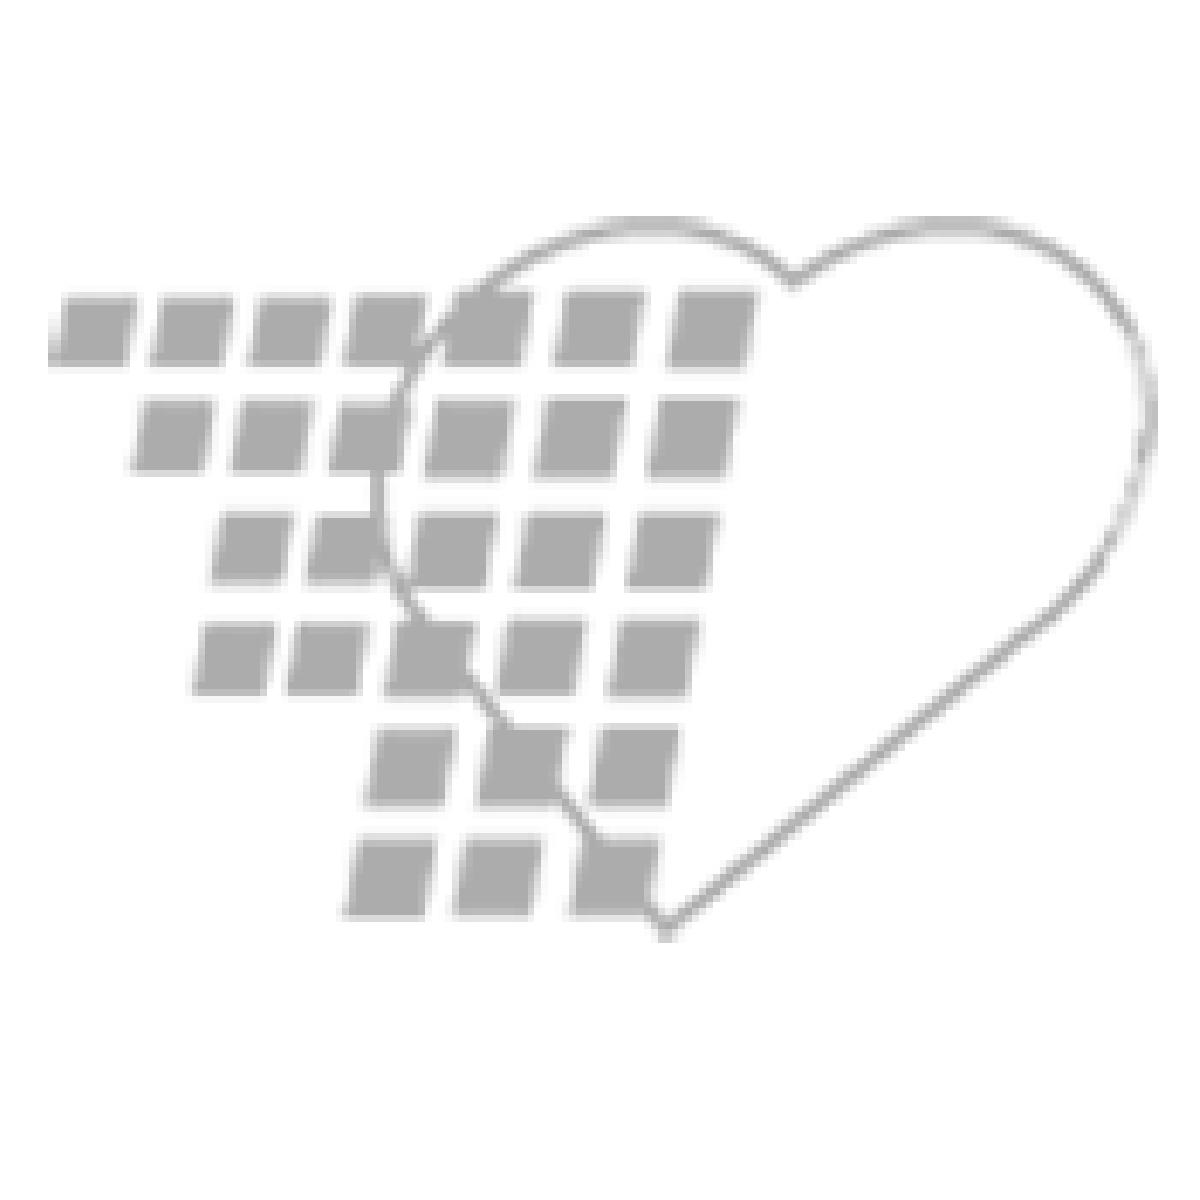 06-93-0700 Demo Dose® Oral Medication Set #1